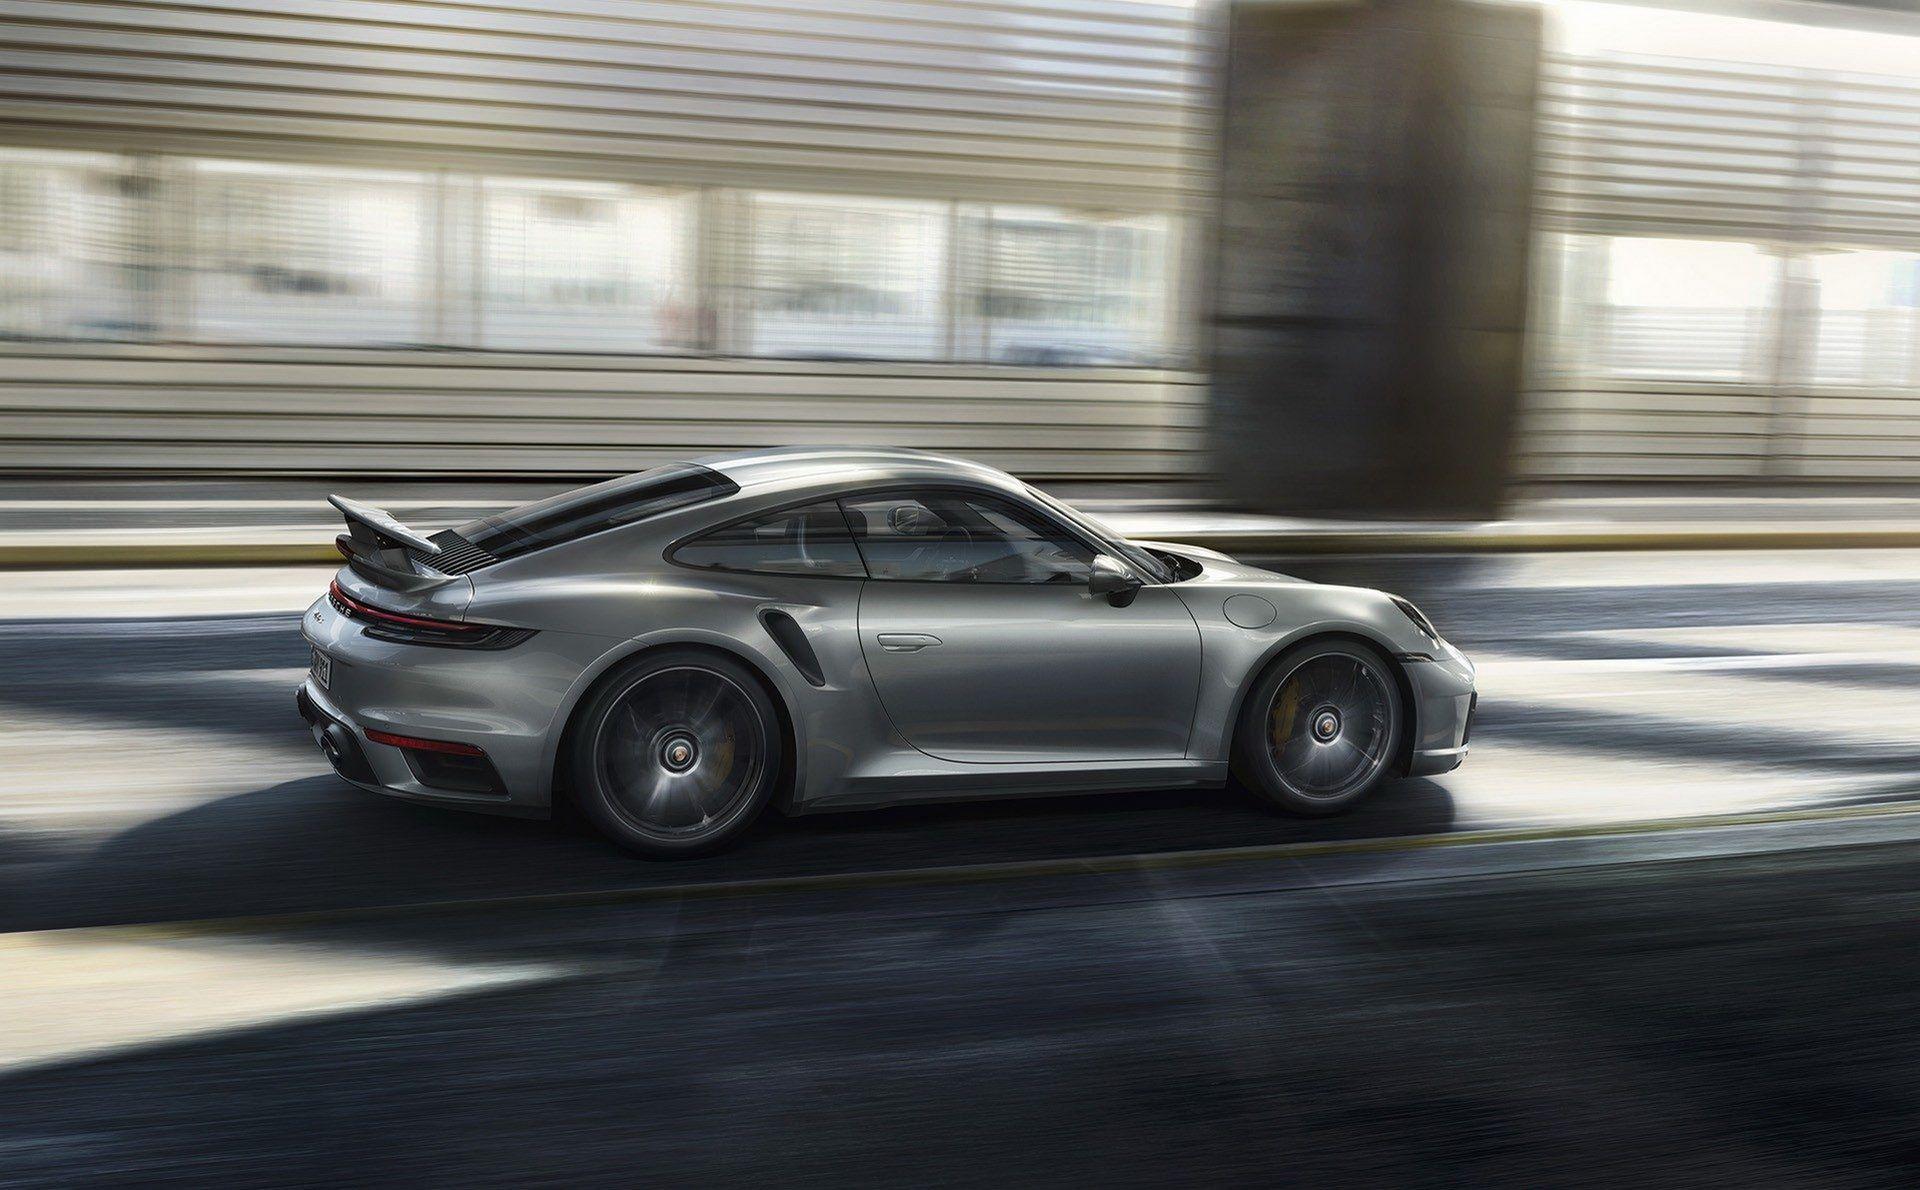 Porsche-911-Turbo-S-2020-39